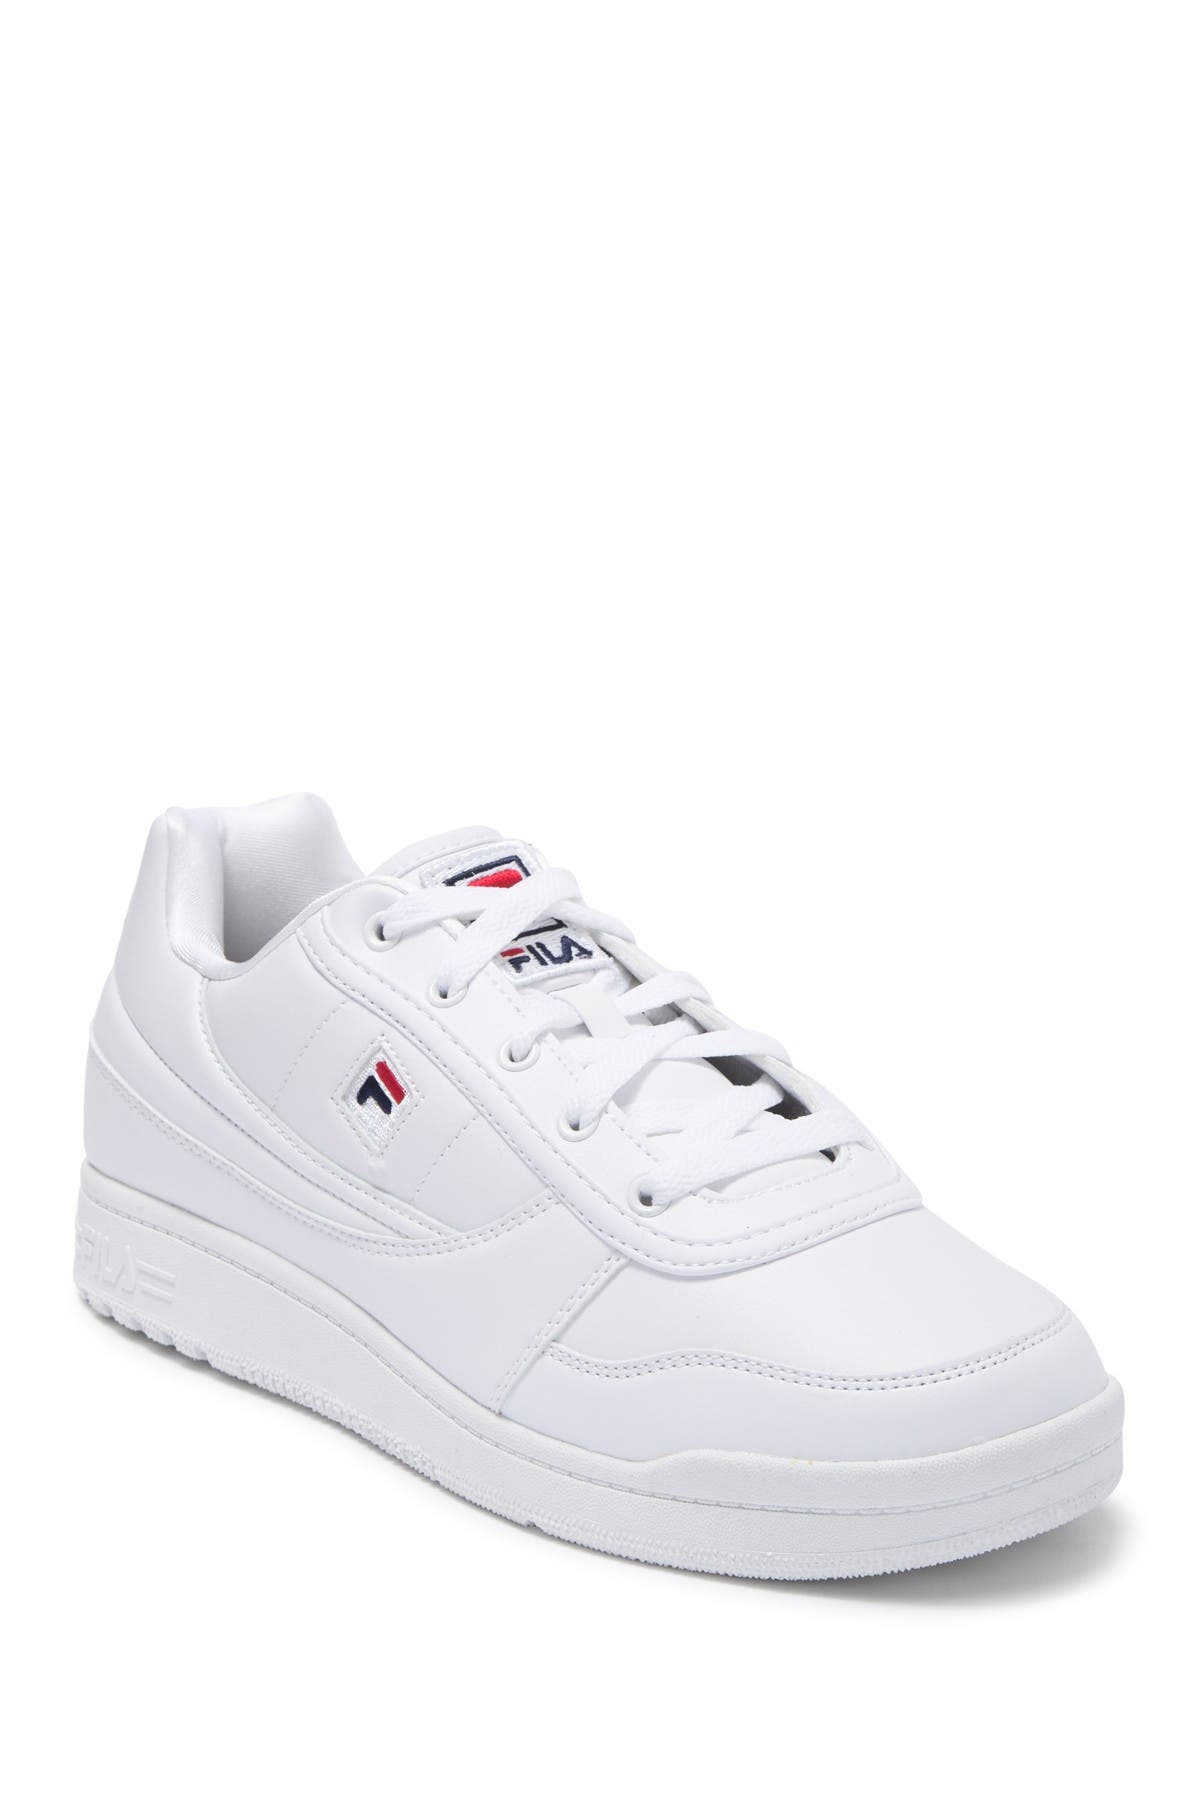 FILA USA | BBN 84 Low Sneaker